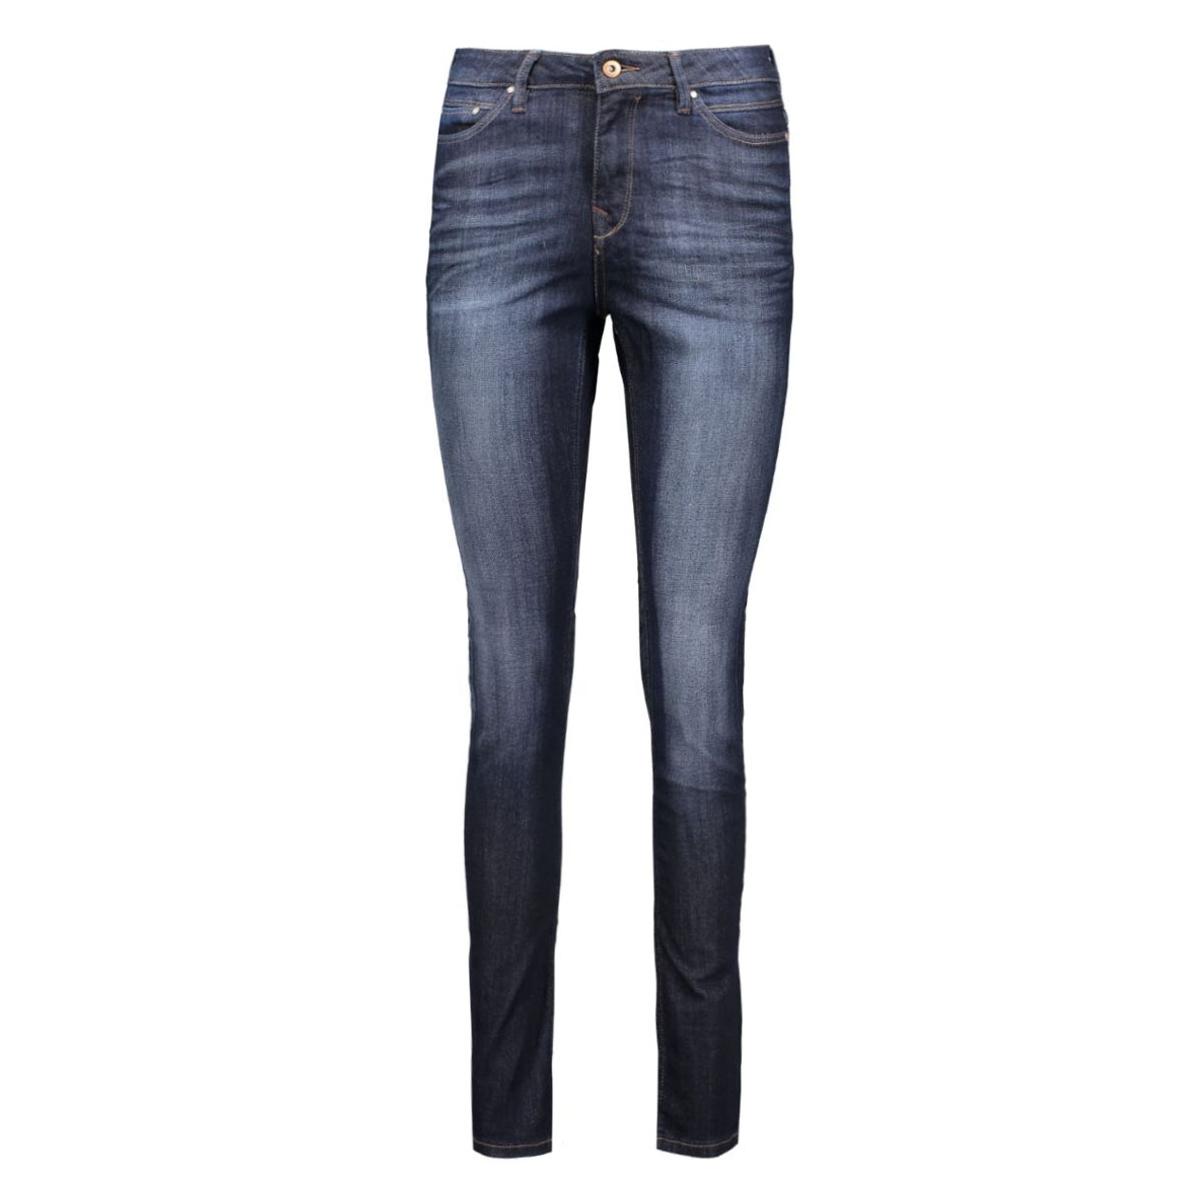 996cc1b909 edc jeans c901